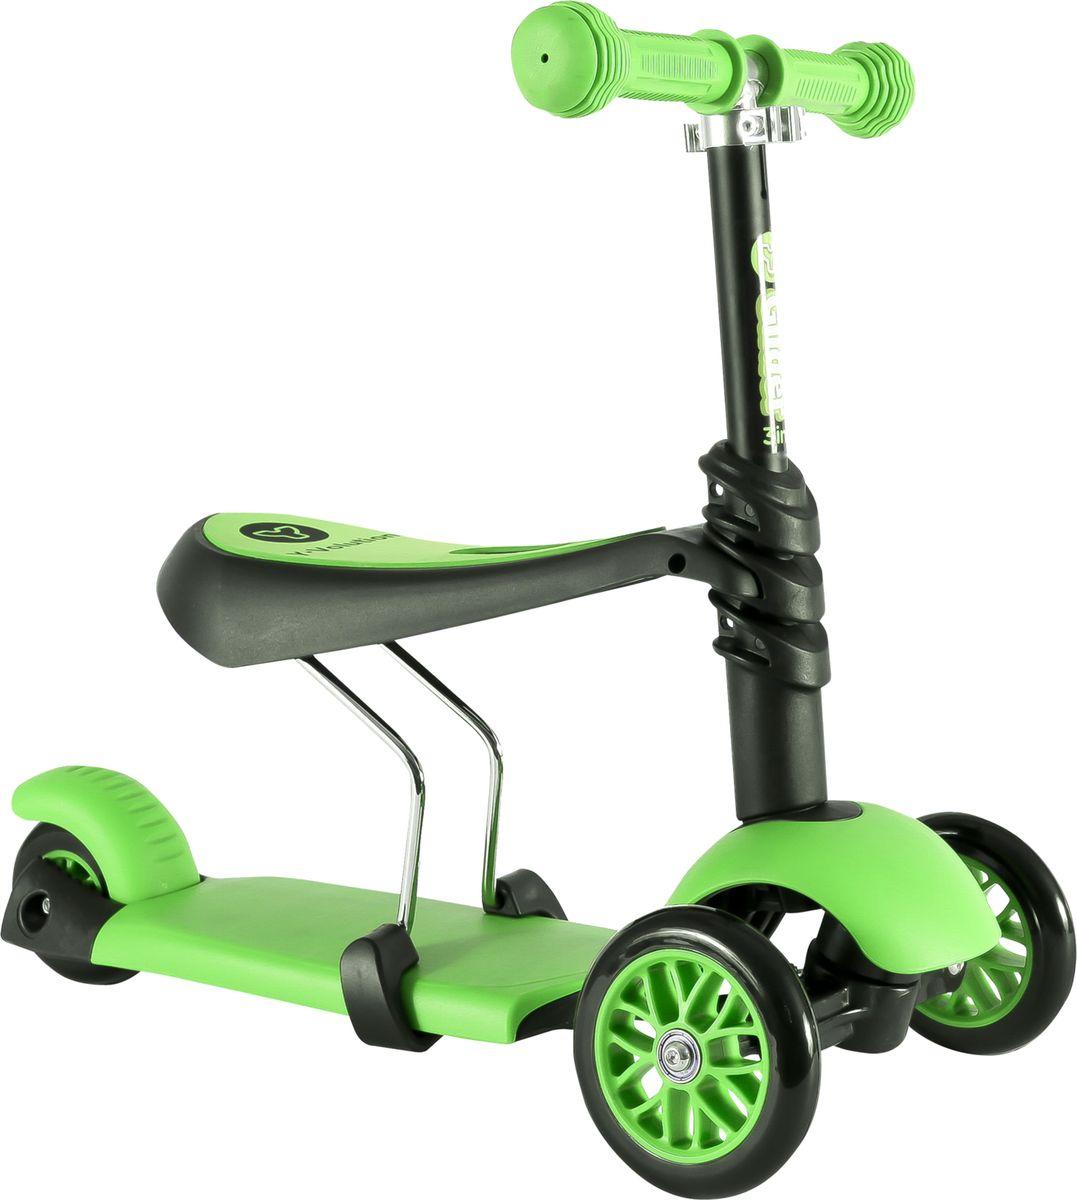 YVolution Самокат-беговел Glider 3 в 1 цвет зеленый -  Беговелы